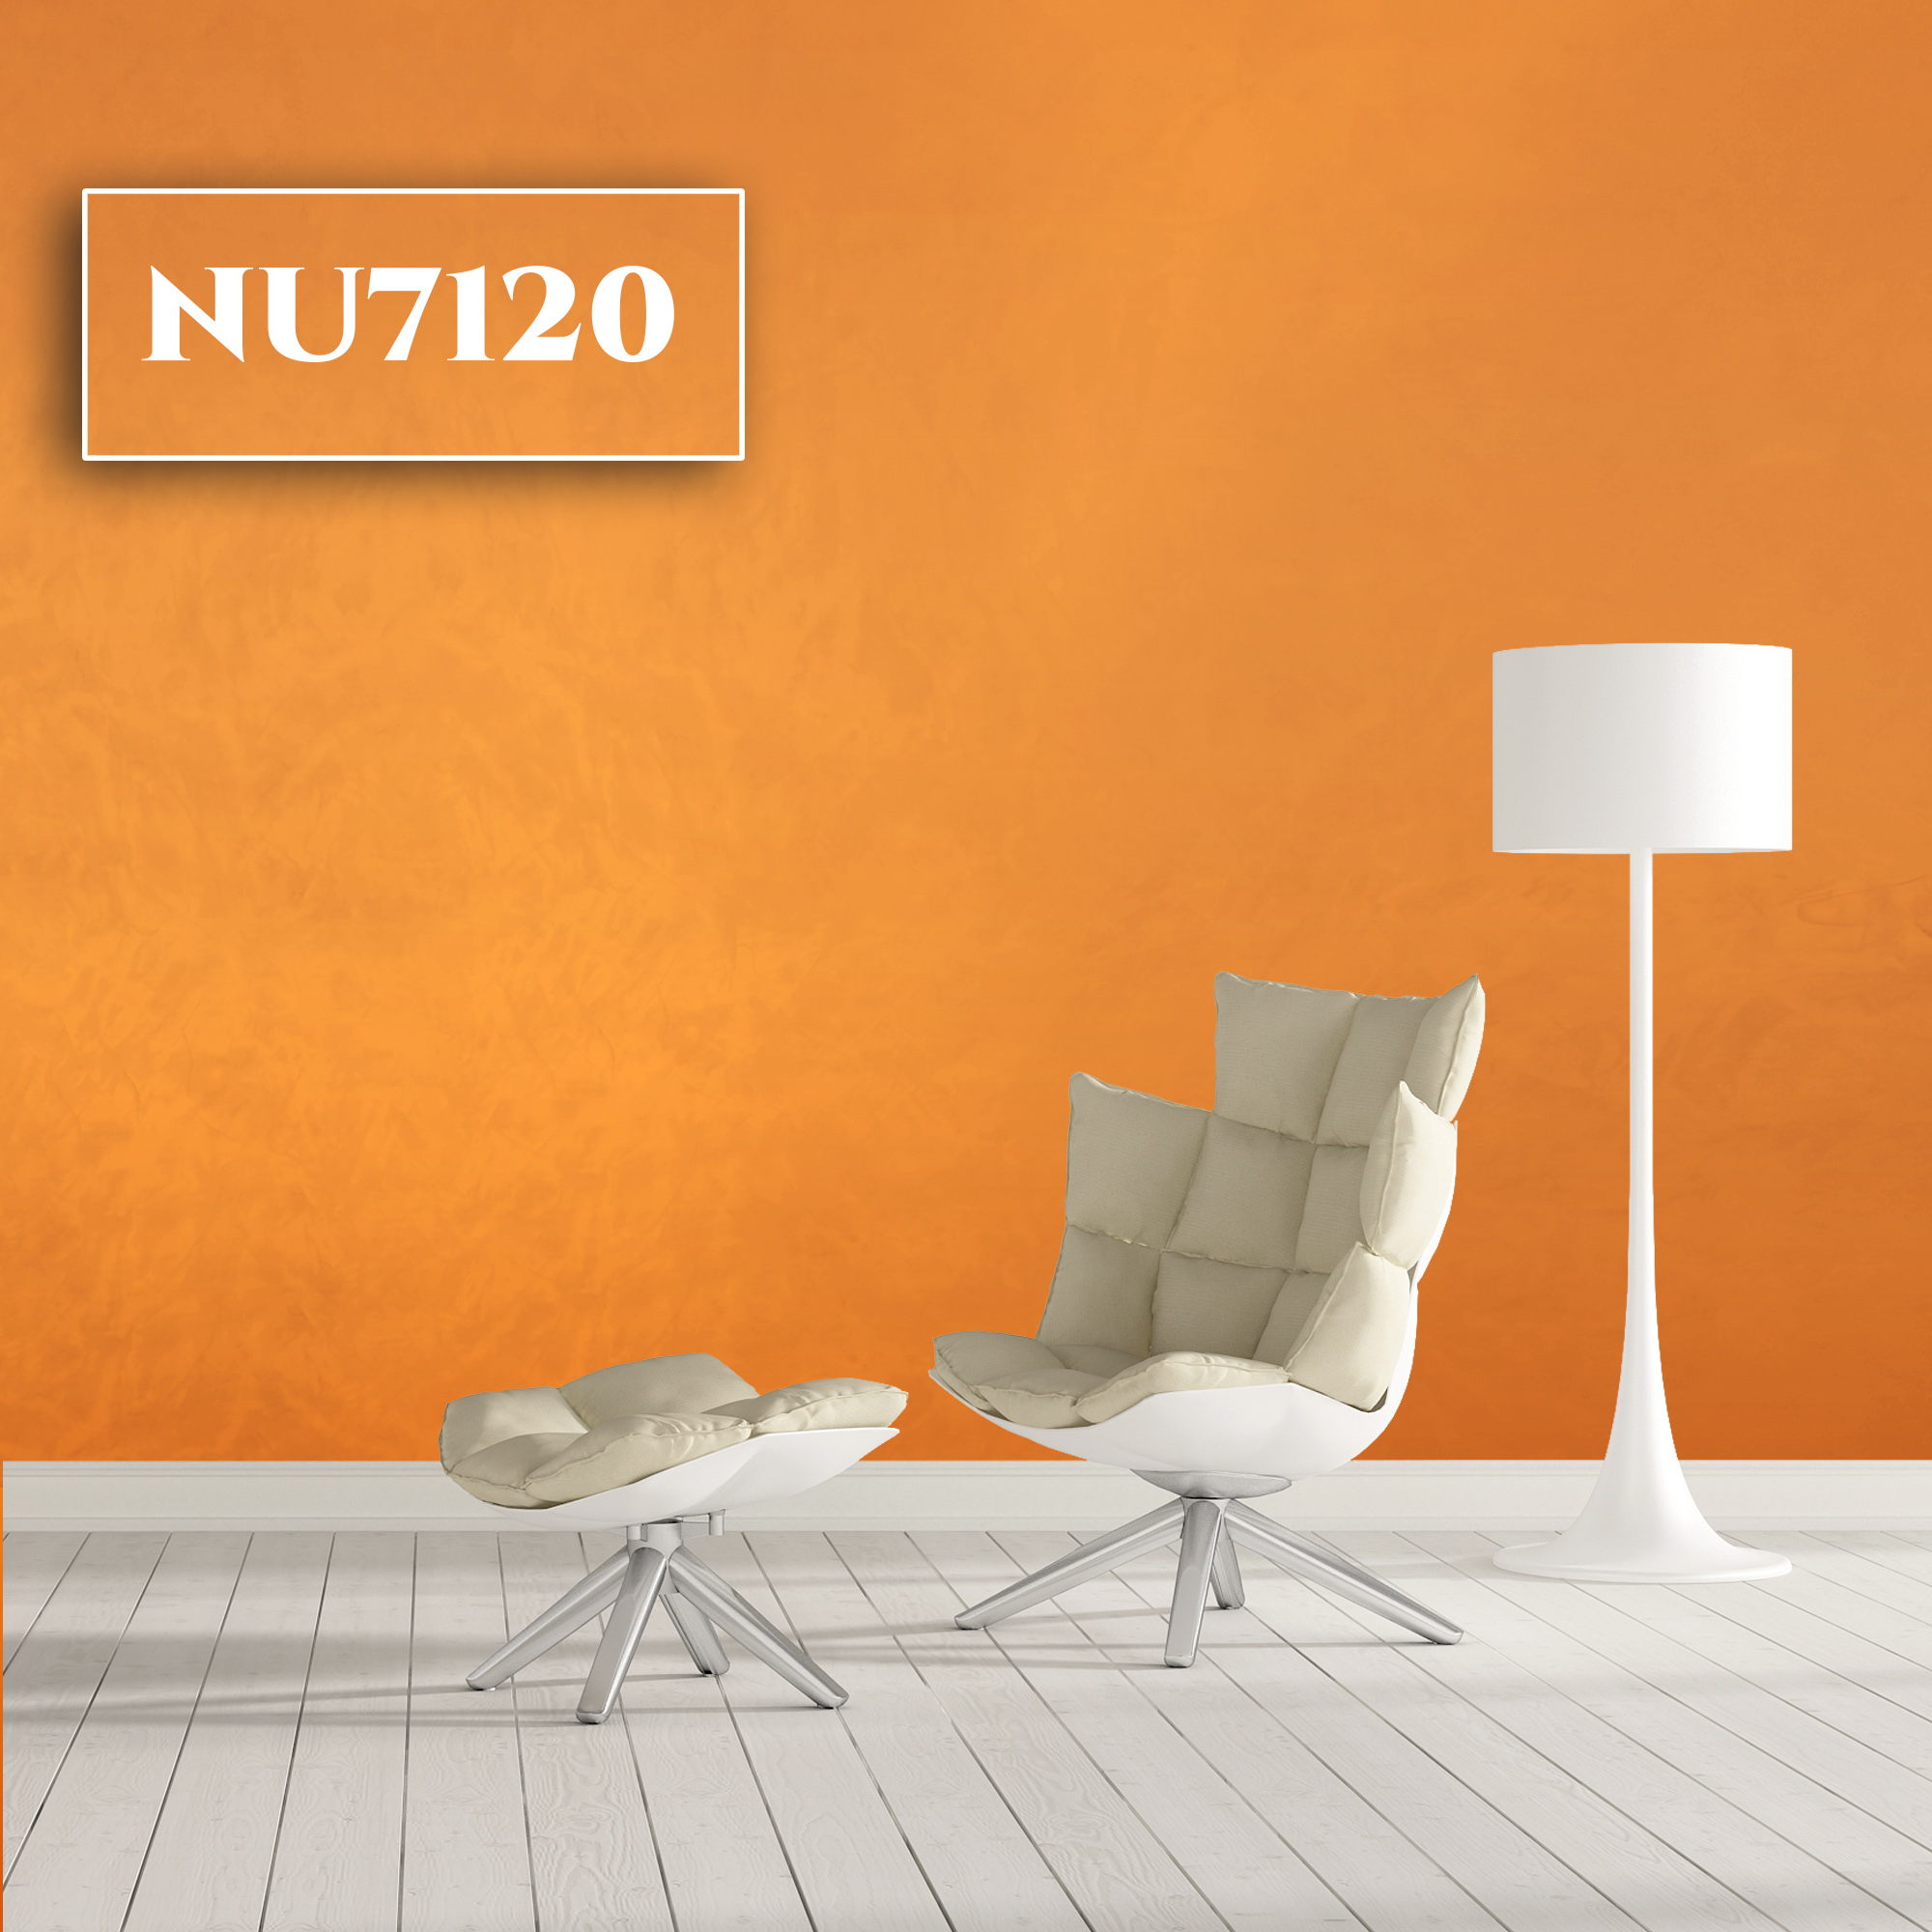 NU7120